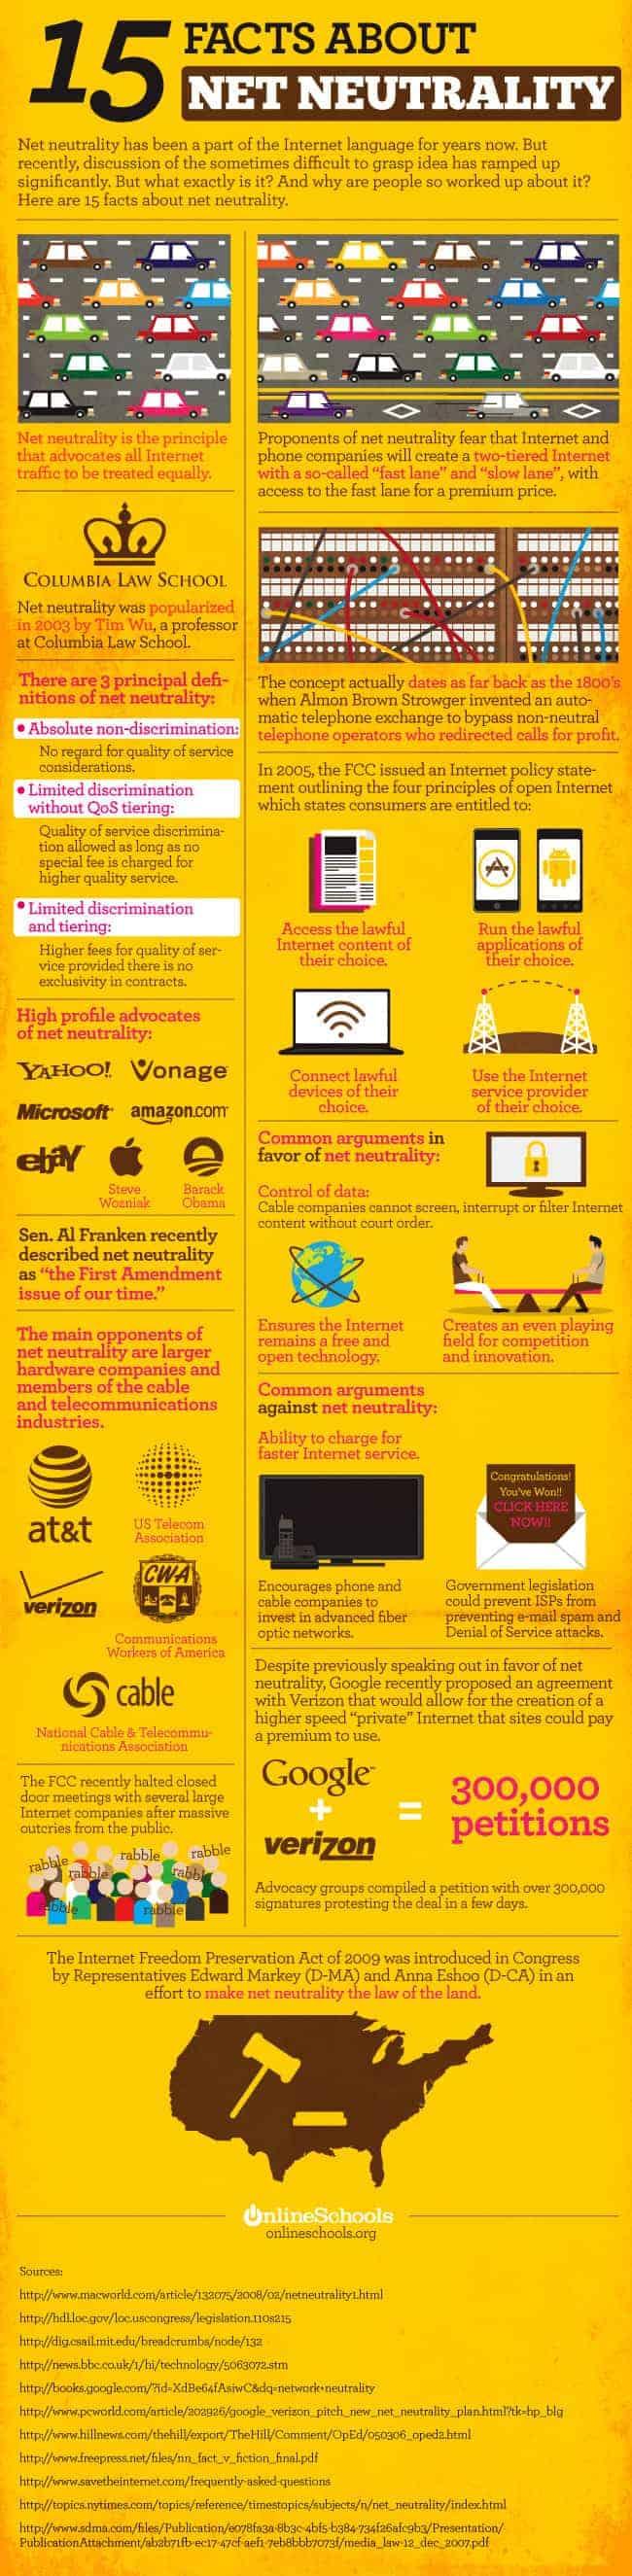 15 fatos sobre Neutralidade da Rede